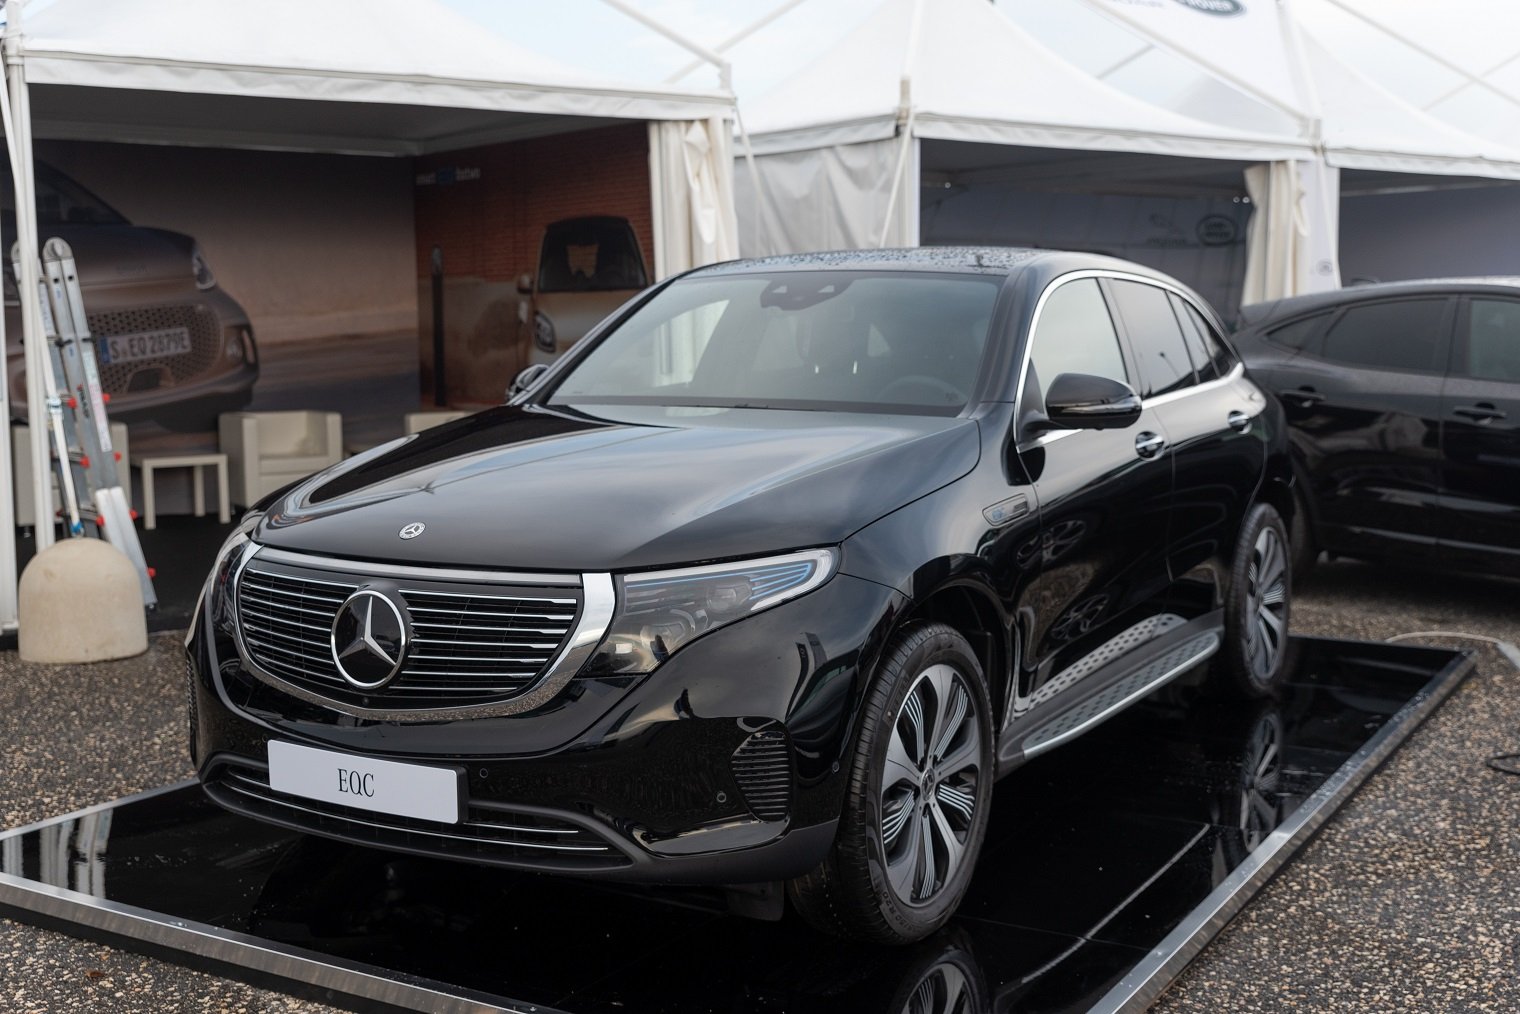 nuova Mercedes EQC Fleet Motor Day 2020